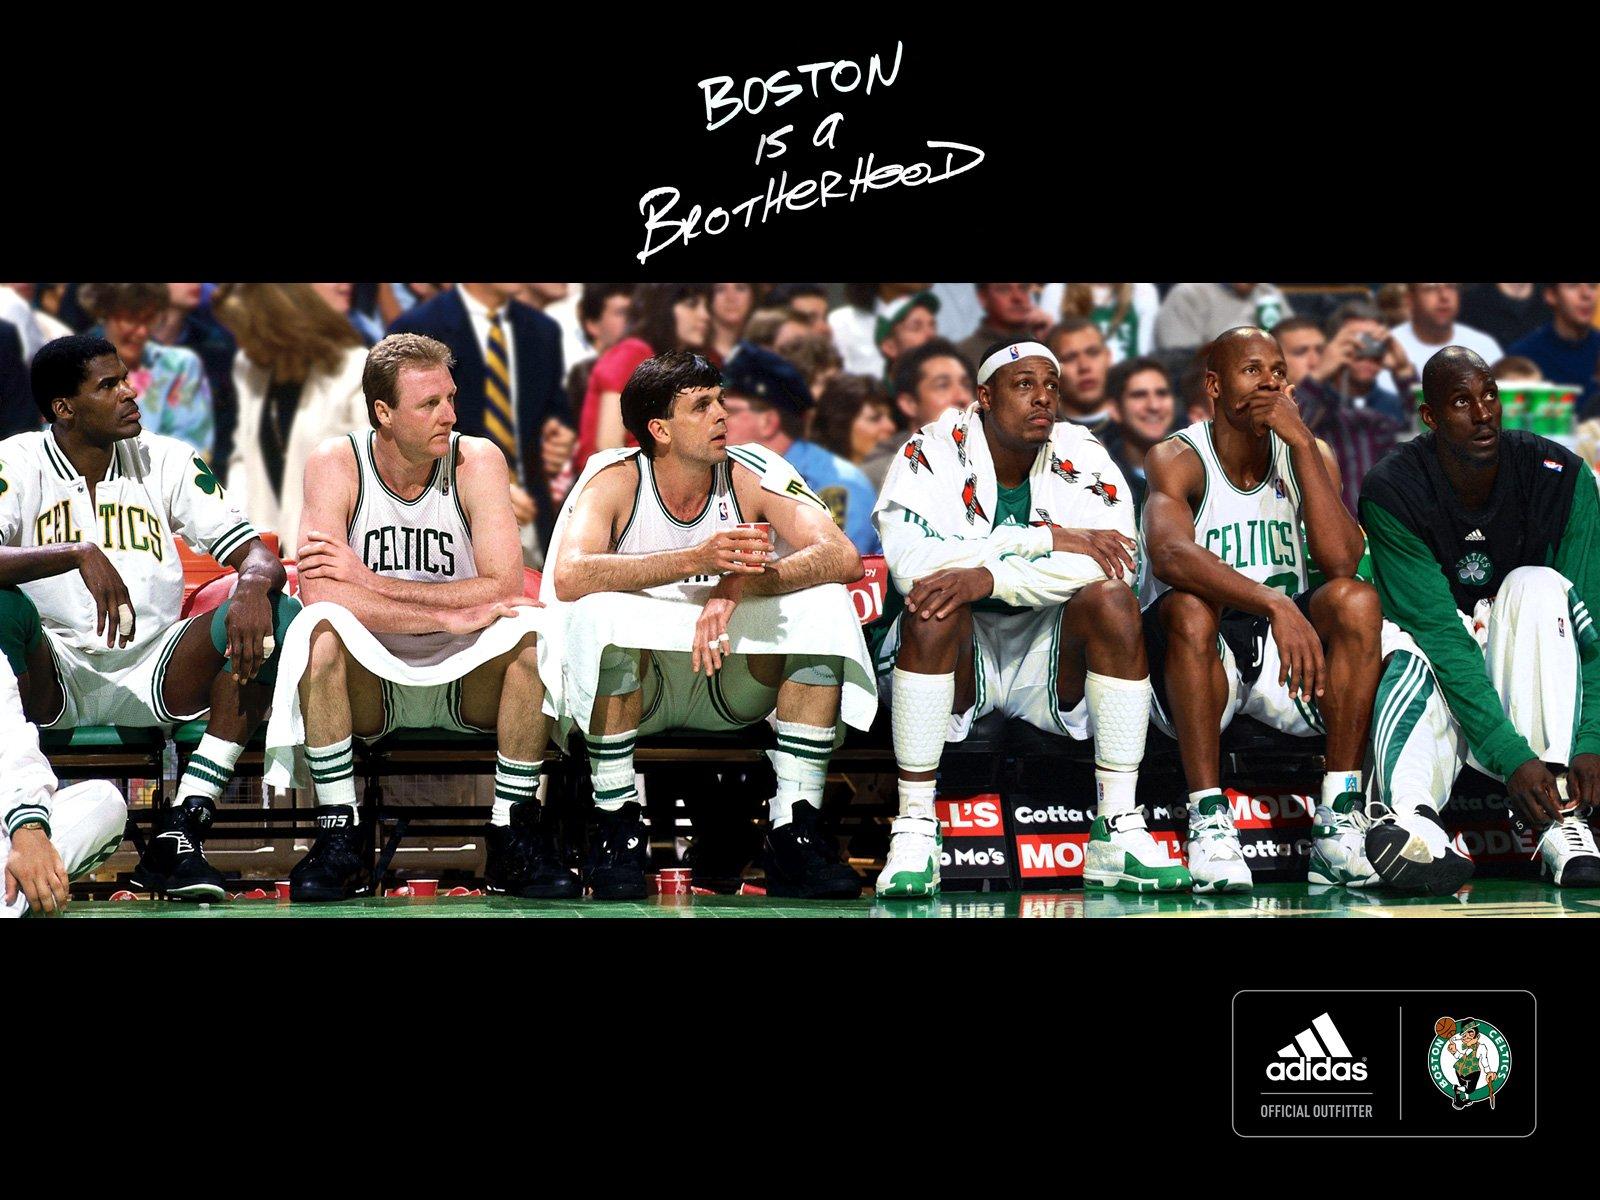 Boston Celtics NBA wallpaper Boston Celtics NBA picture 1600x1200